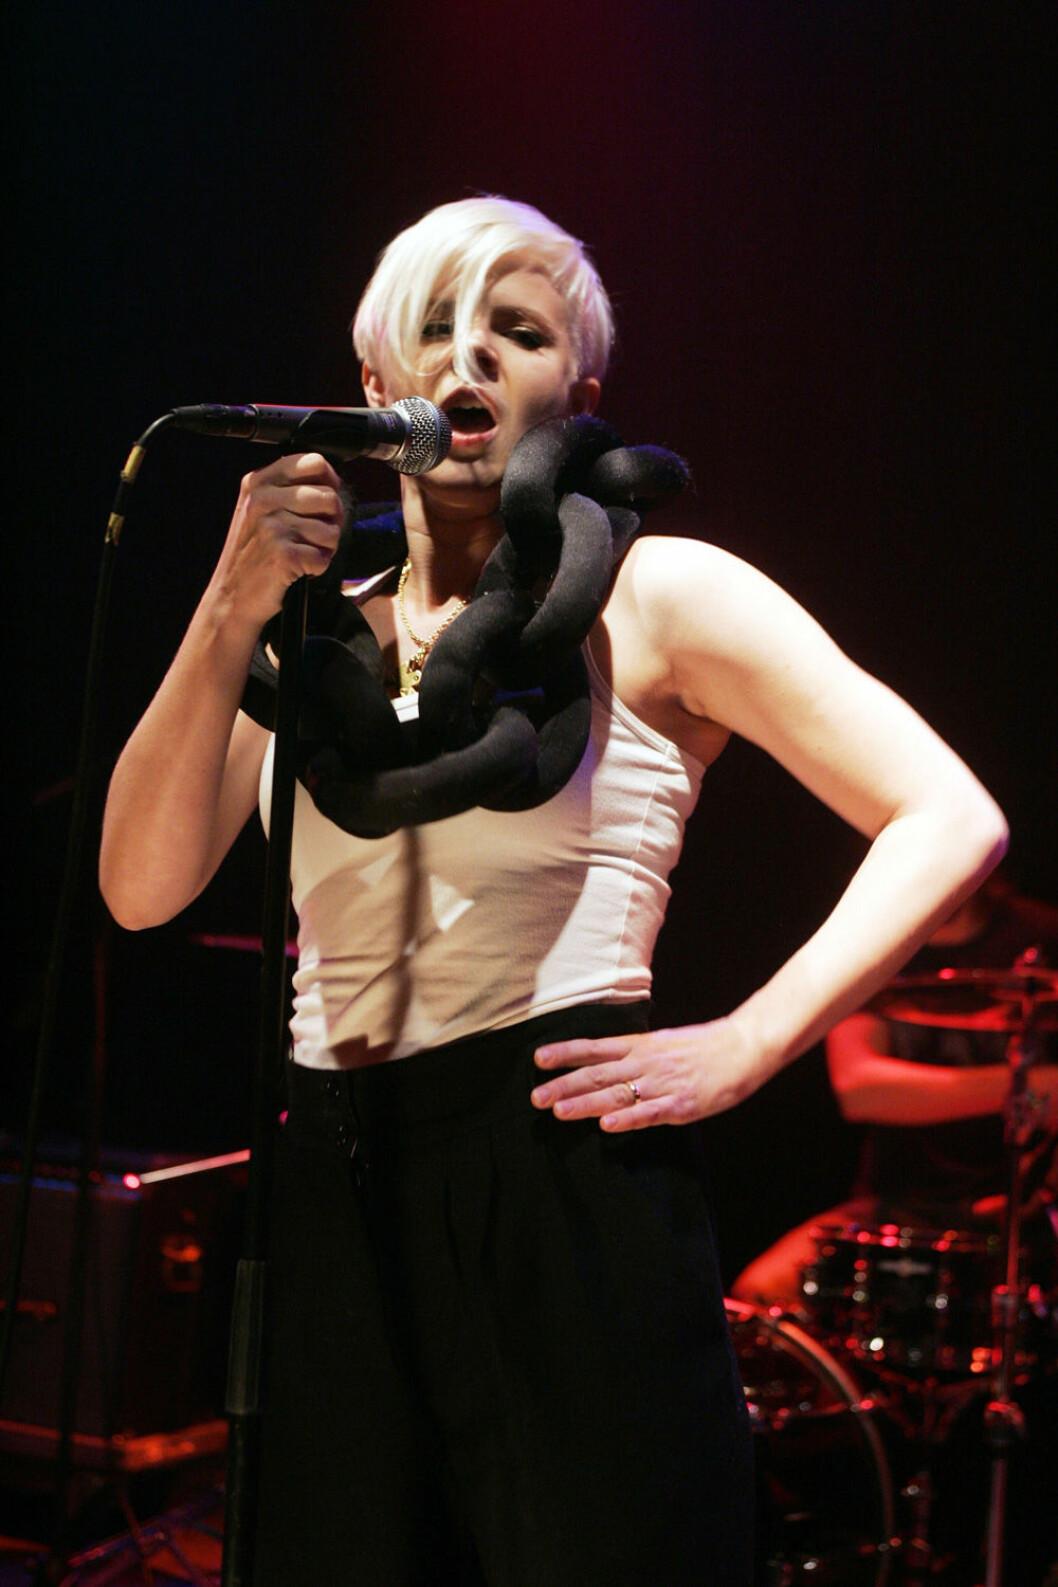 Robyn i over size halsband på spelning i Tyskland 2007.